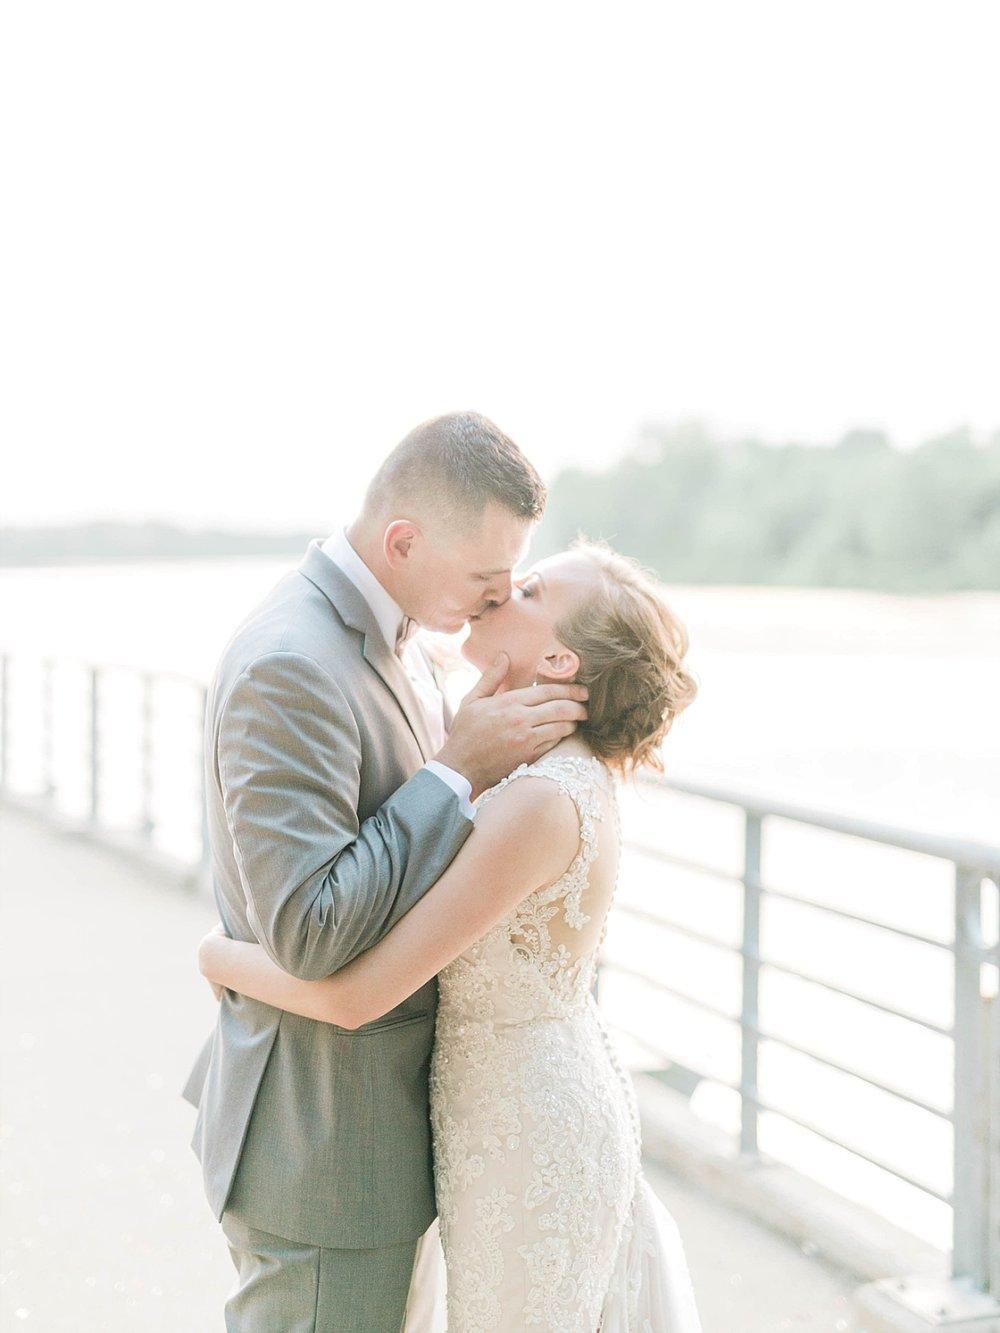 Madison wedding miriam bulcher photography